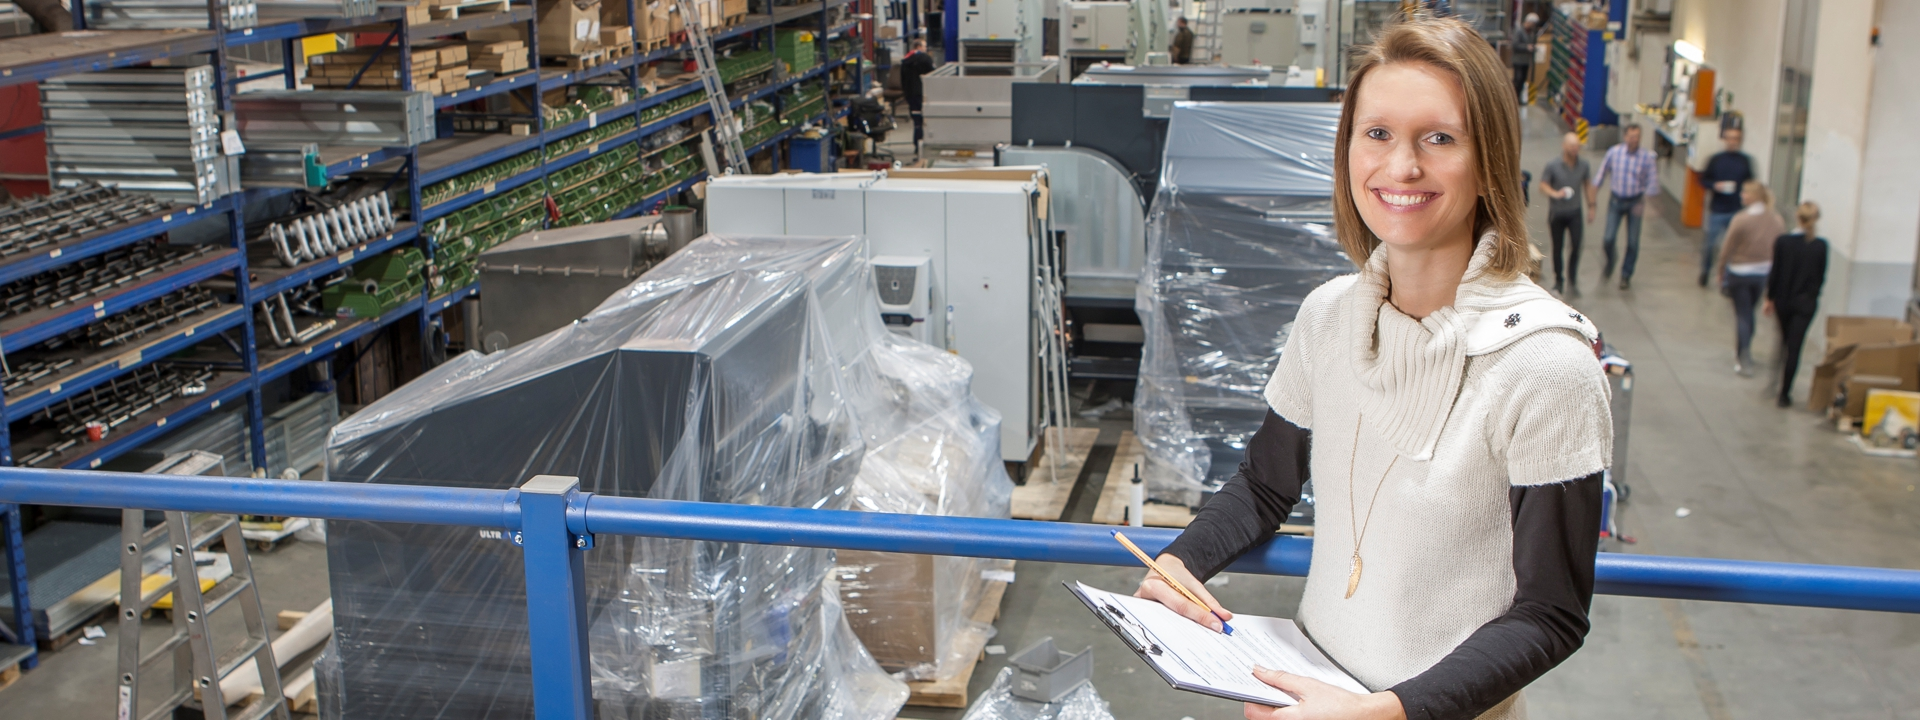 Produktionsassistentin bei KMA Umwelttechnik